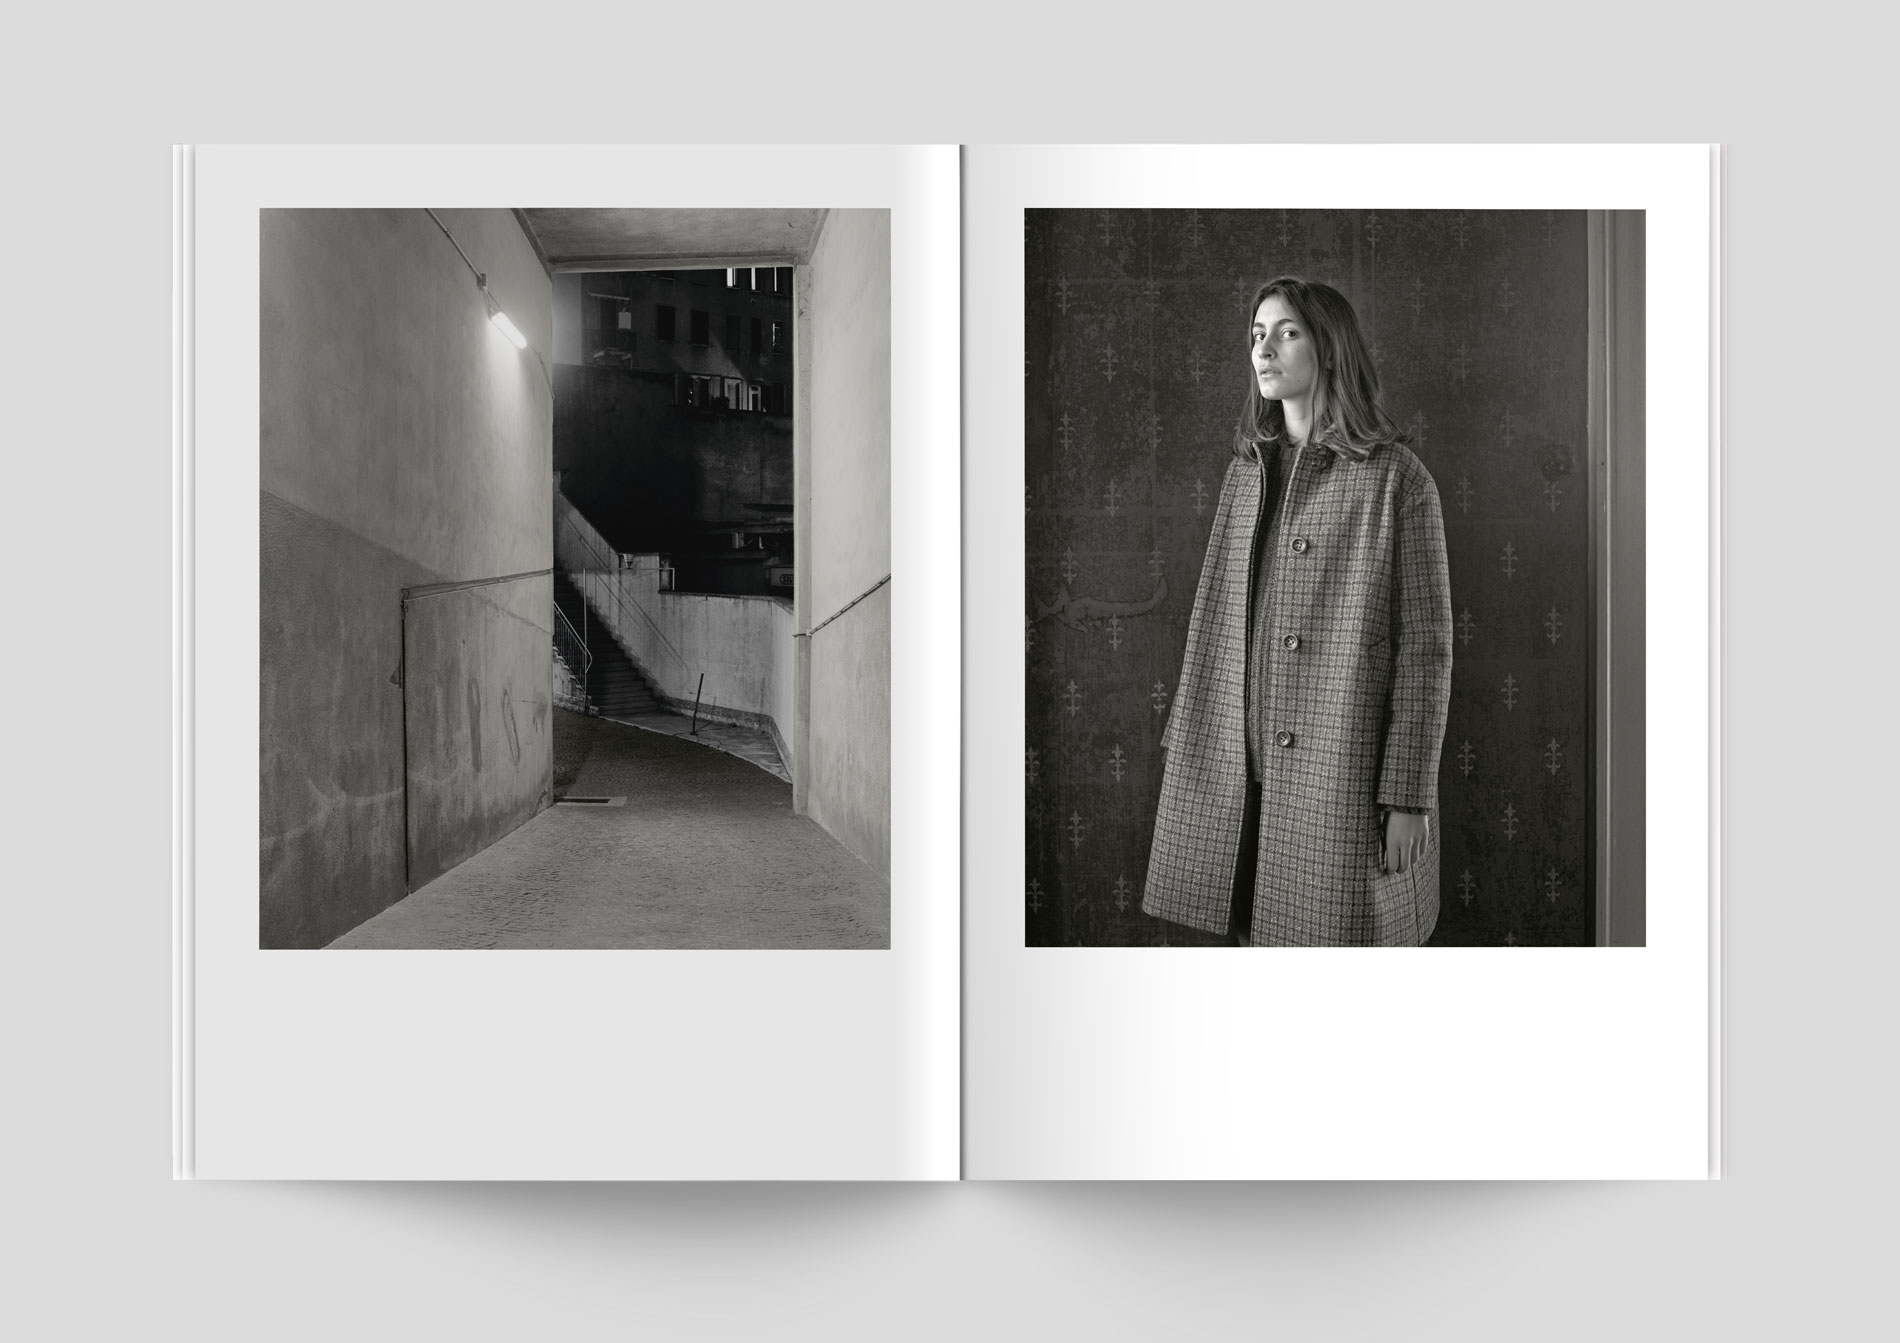 Santoni-Edited-by-Marco-Zanini-Ingar-Krauss-04